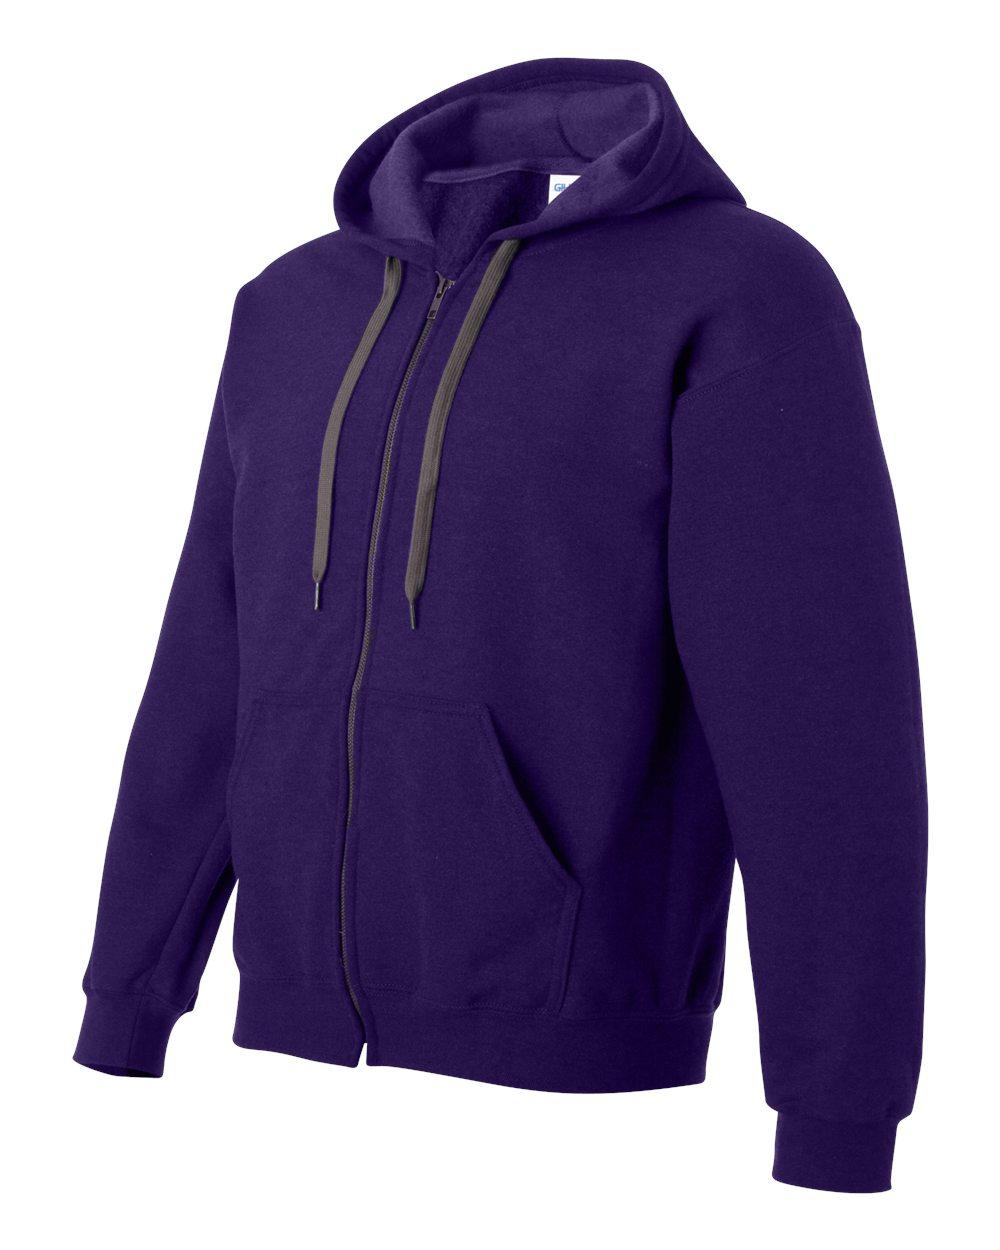 Gildan Vintage Classic Full Zip Hooded Sweatshirt GIL18700 Blackberry